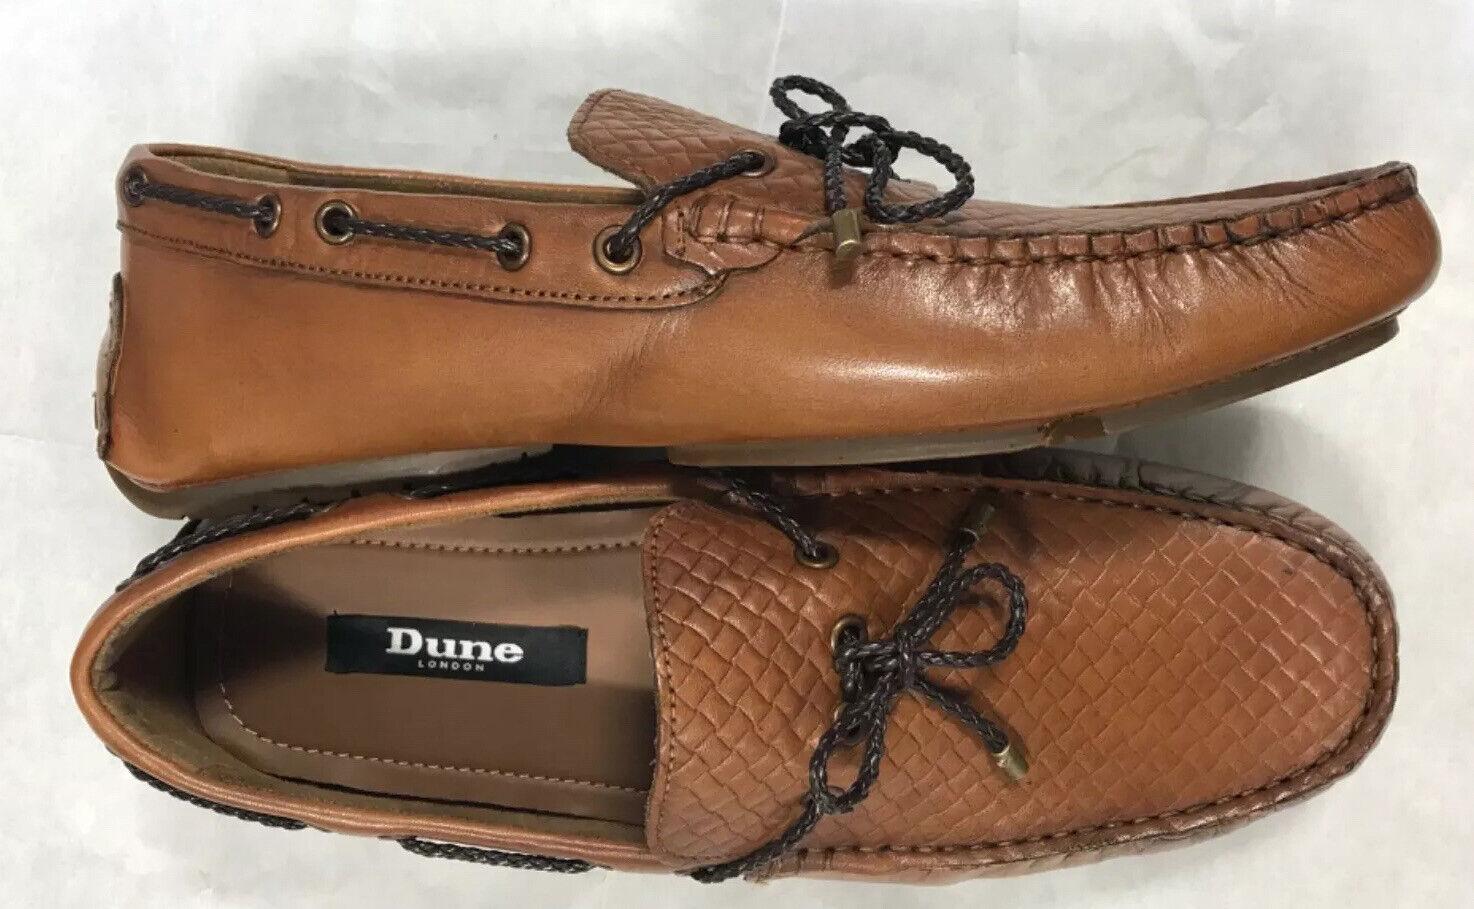 Dune London Boston Slip-on Leather Men's Loafers Moccasin Shoes UK 8 EU 42